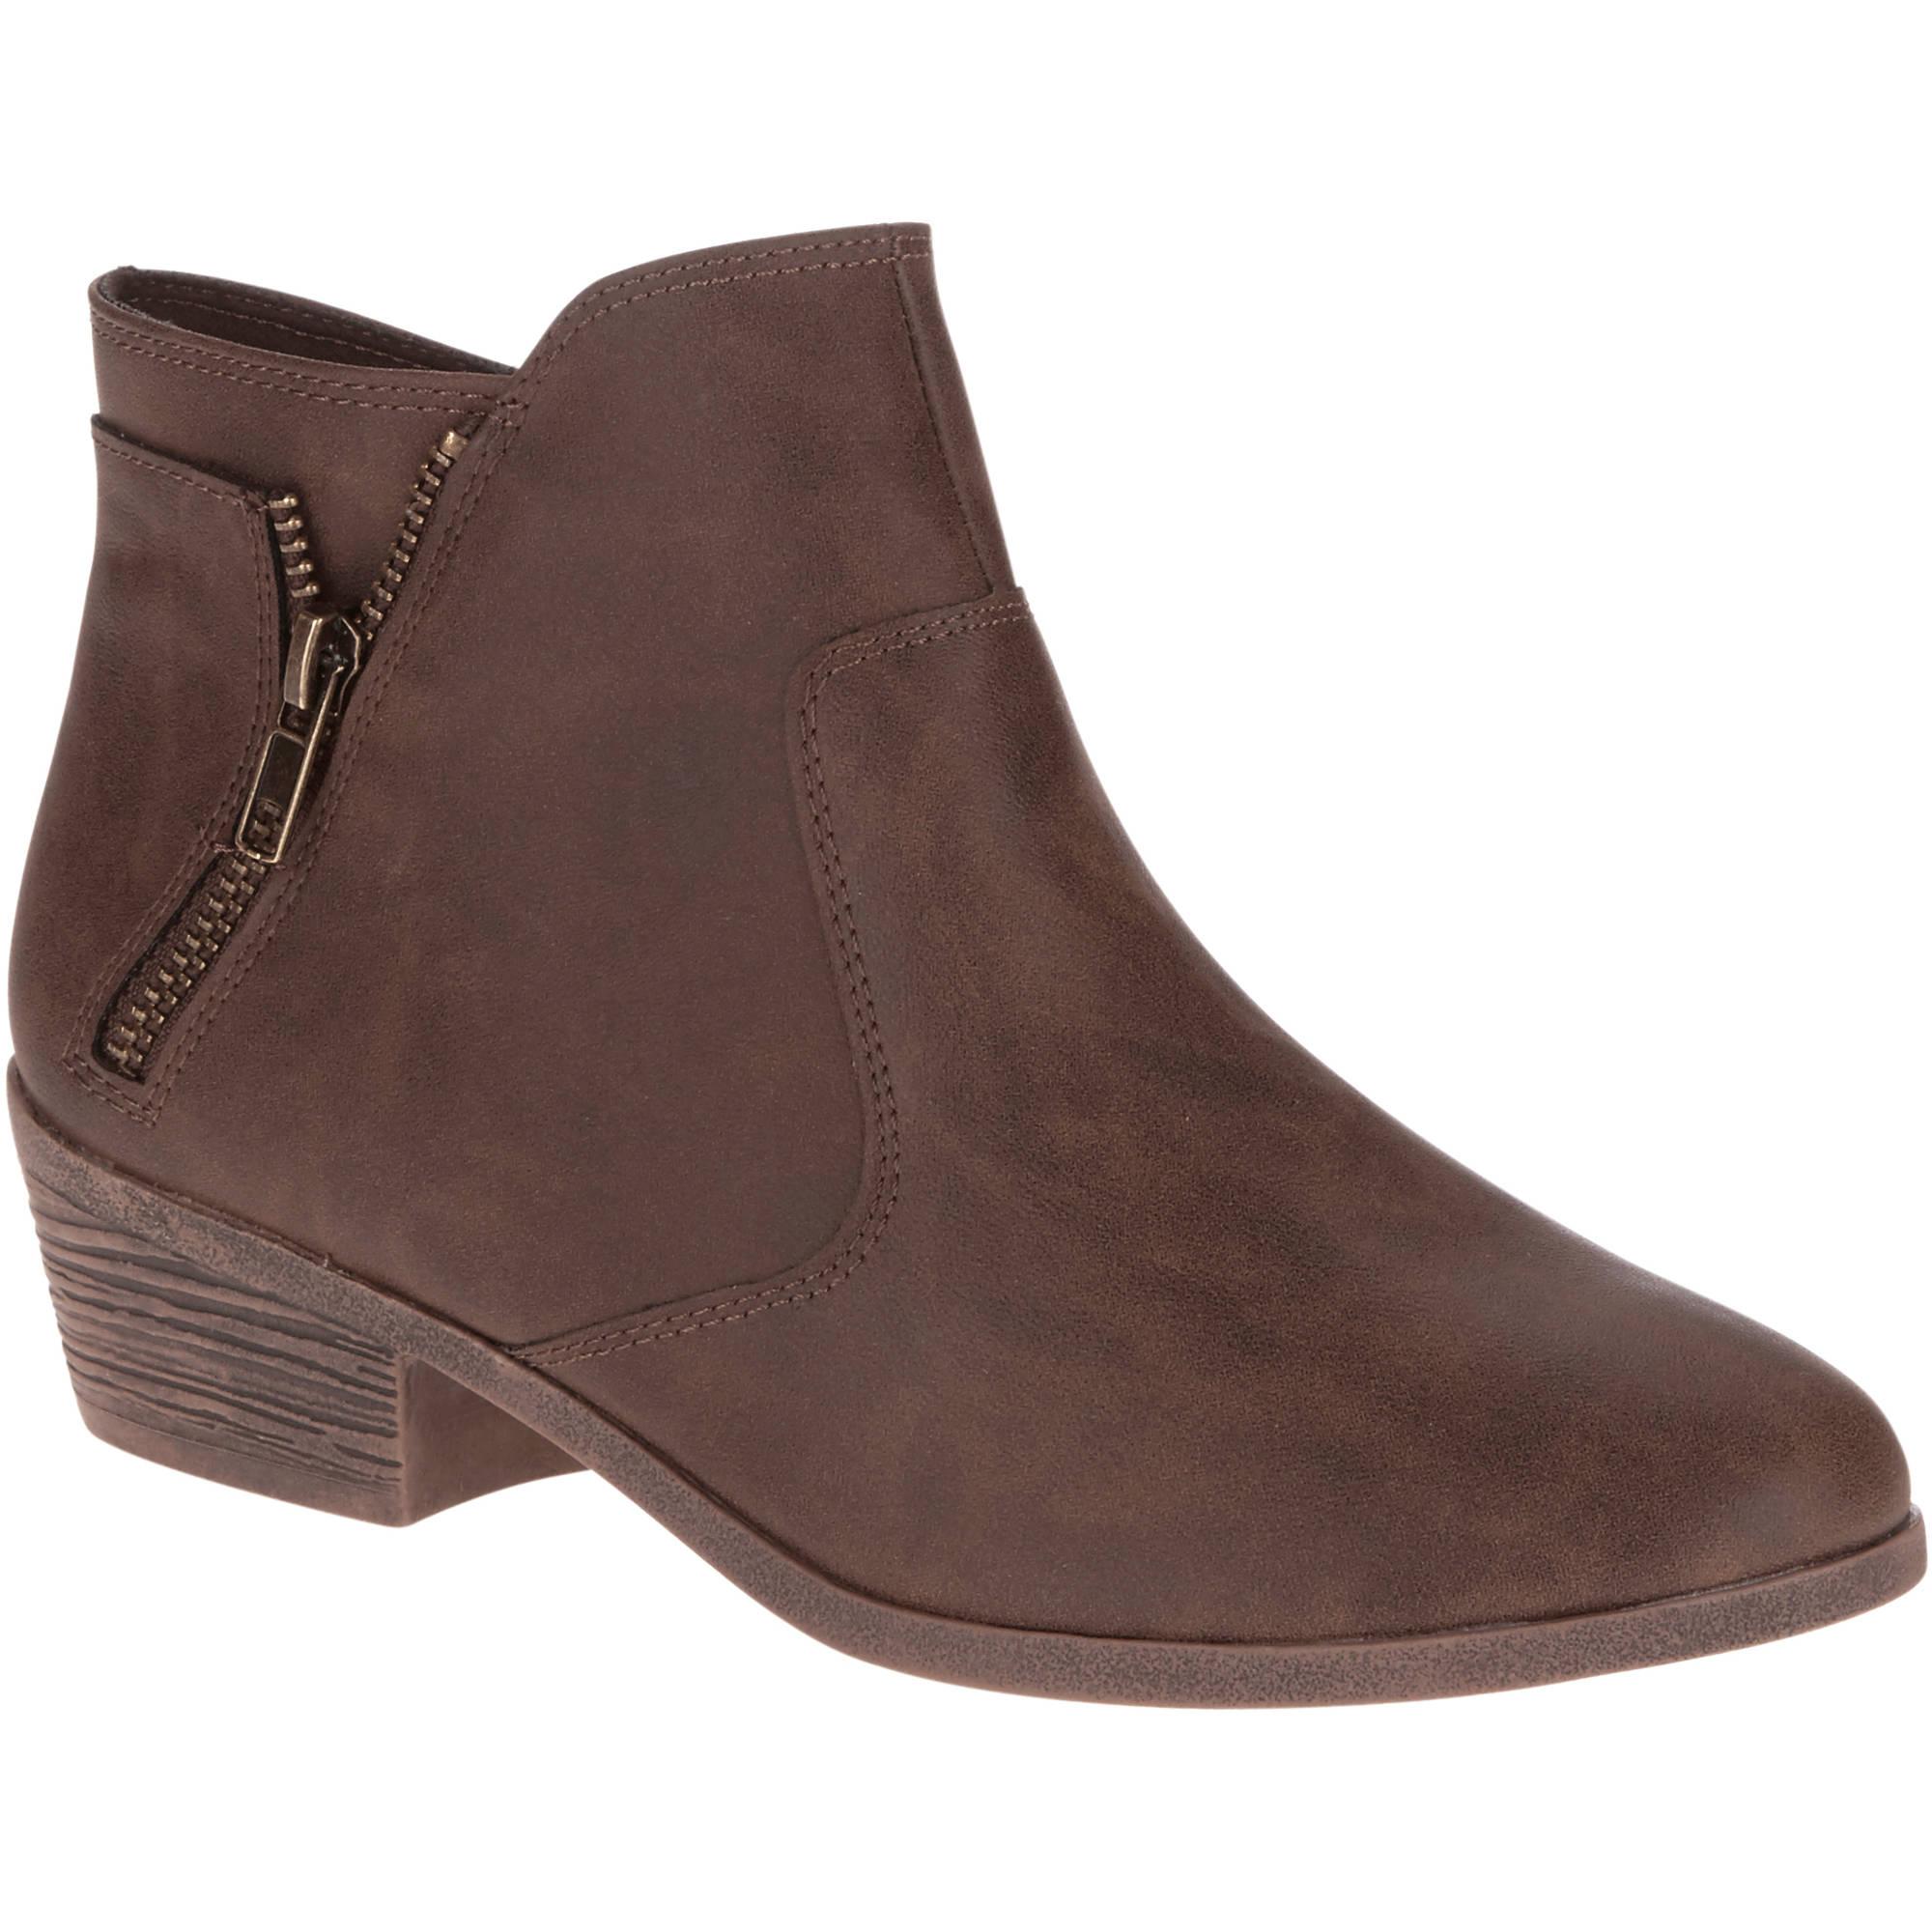 faded s zipper boot walmart